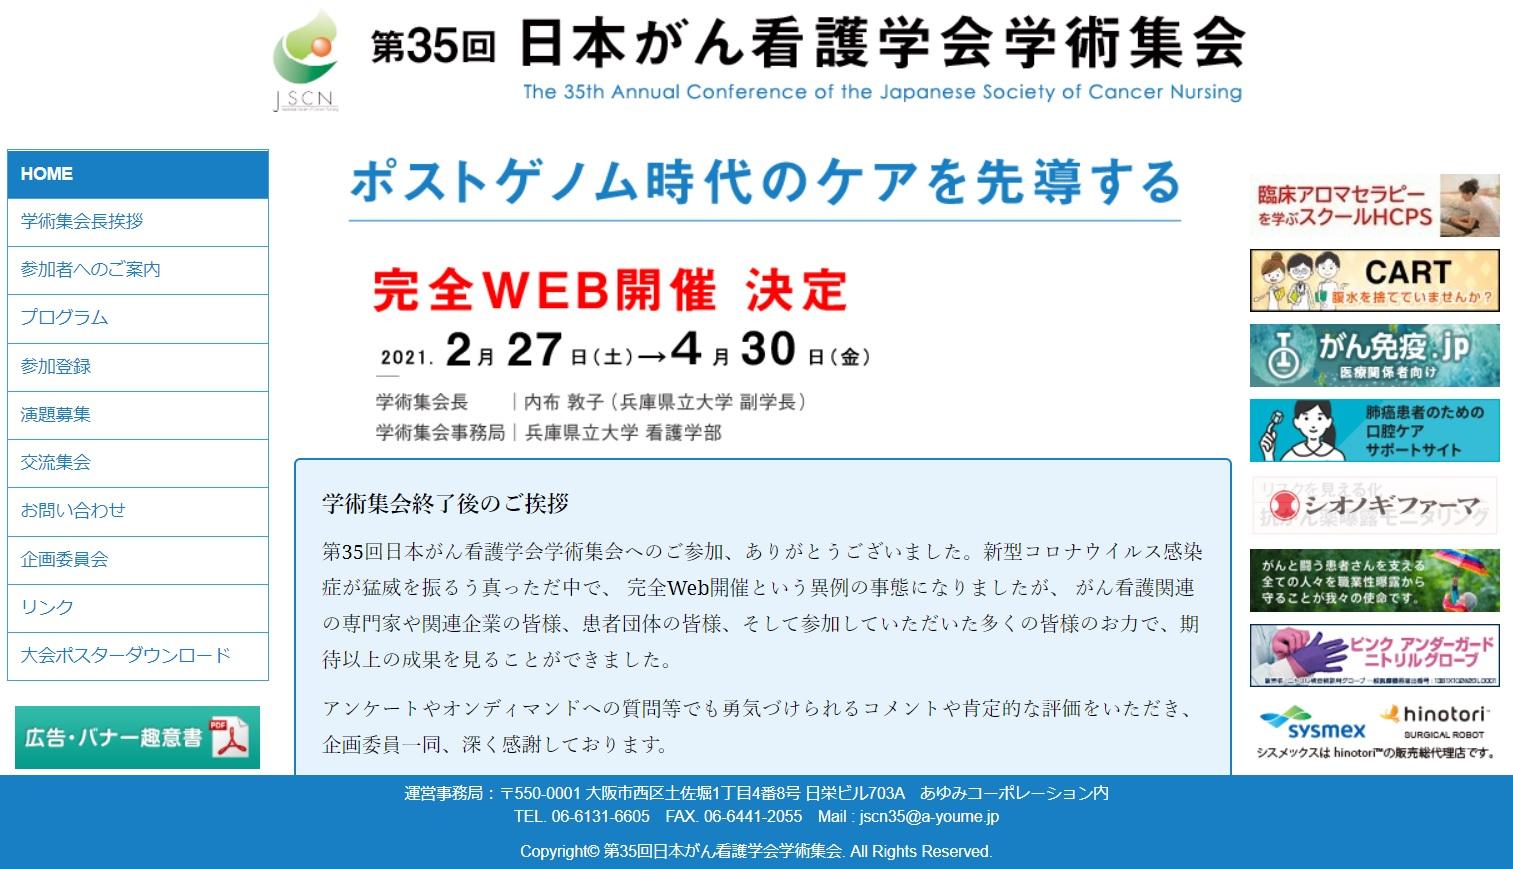 第35回日本がん看護学会学術集会